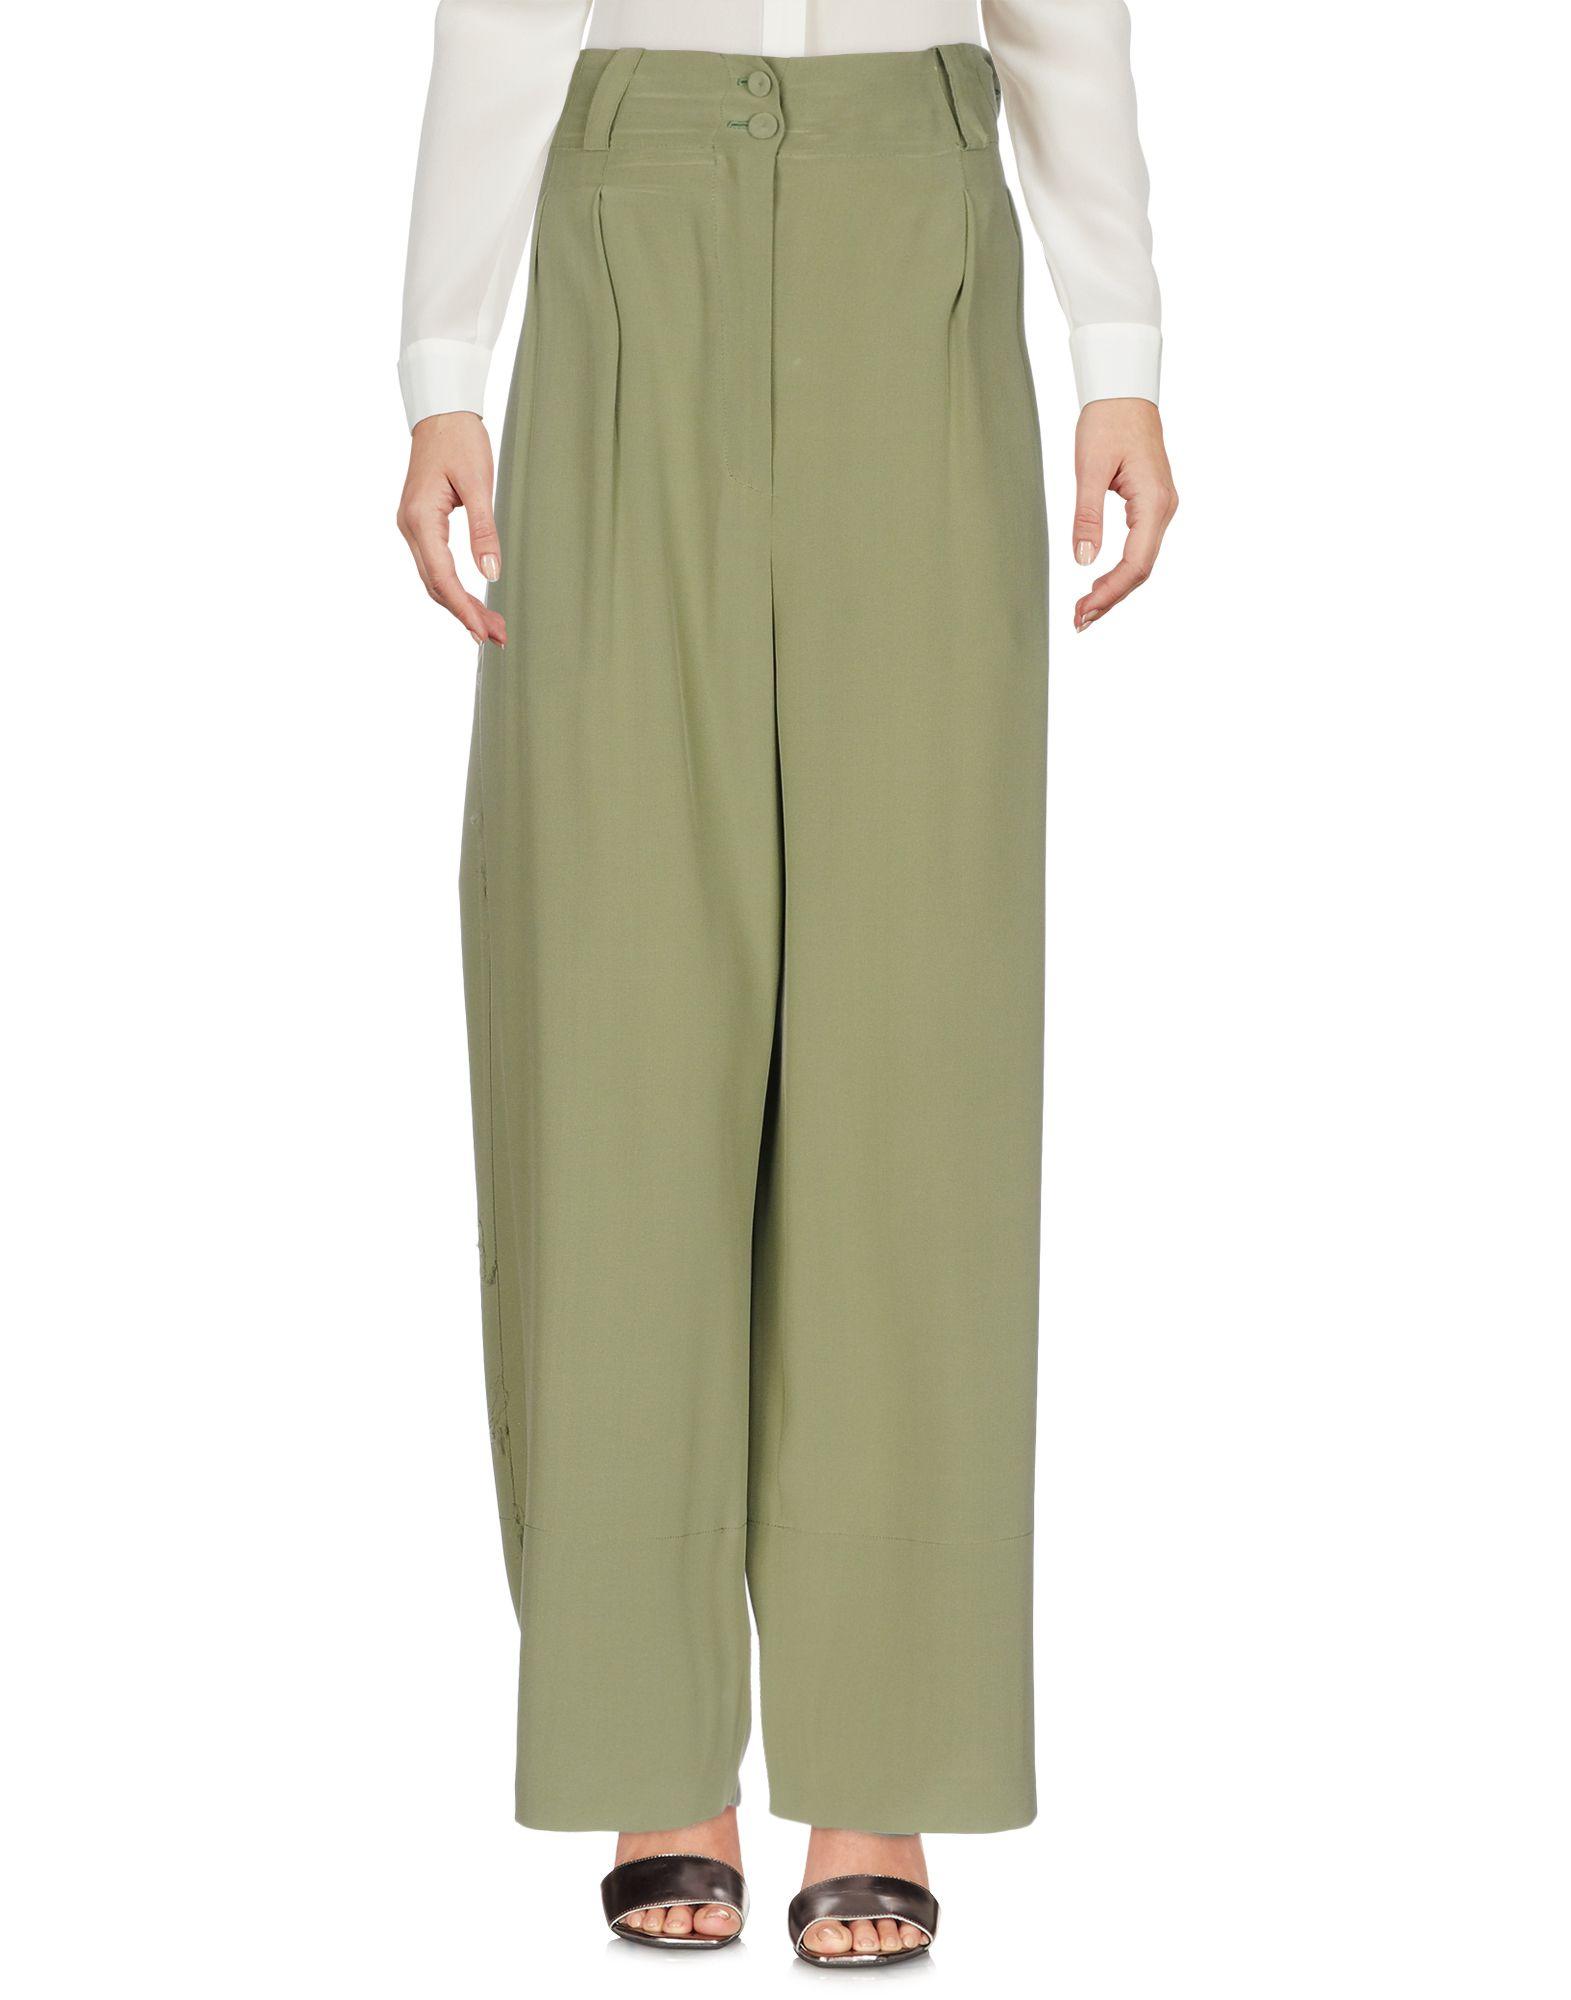 MAFALDA VON HESSEN Casual Pants in Military Green